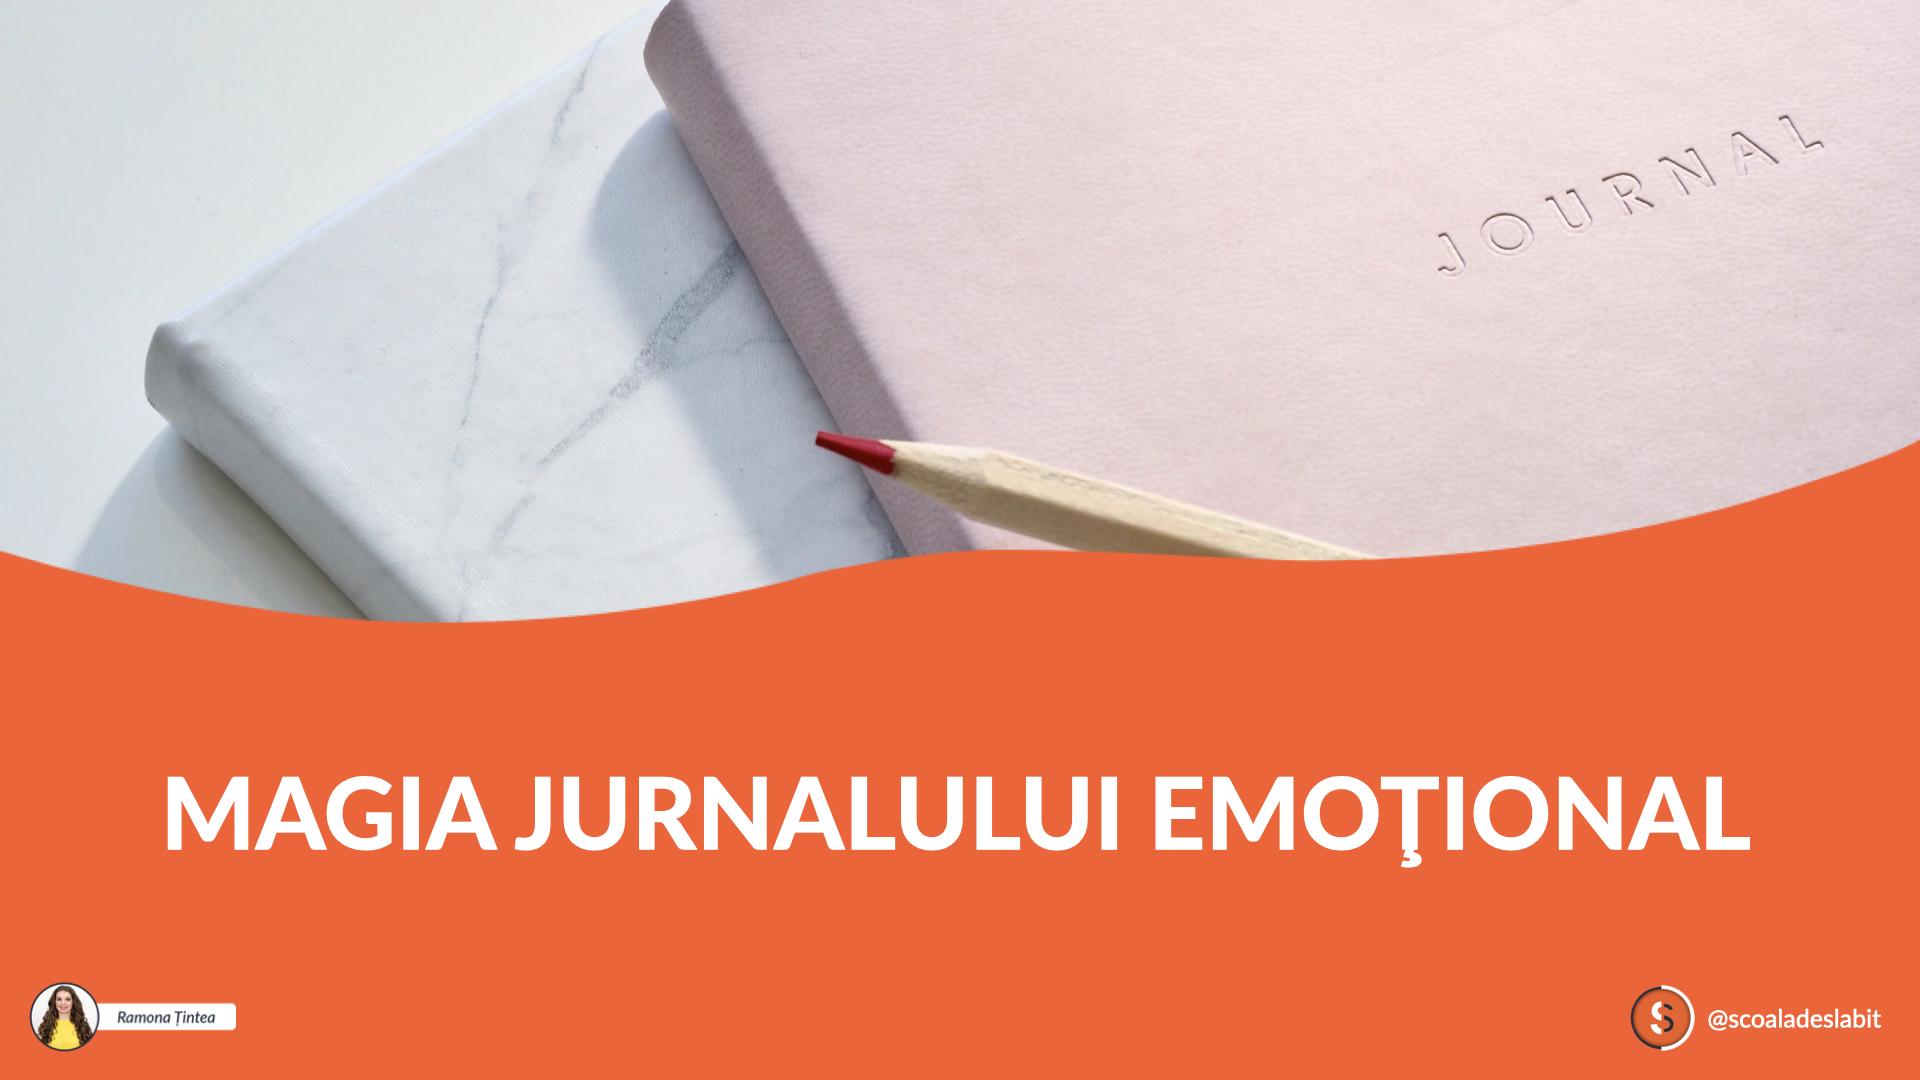 Magia Jurnalului Emoțional